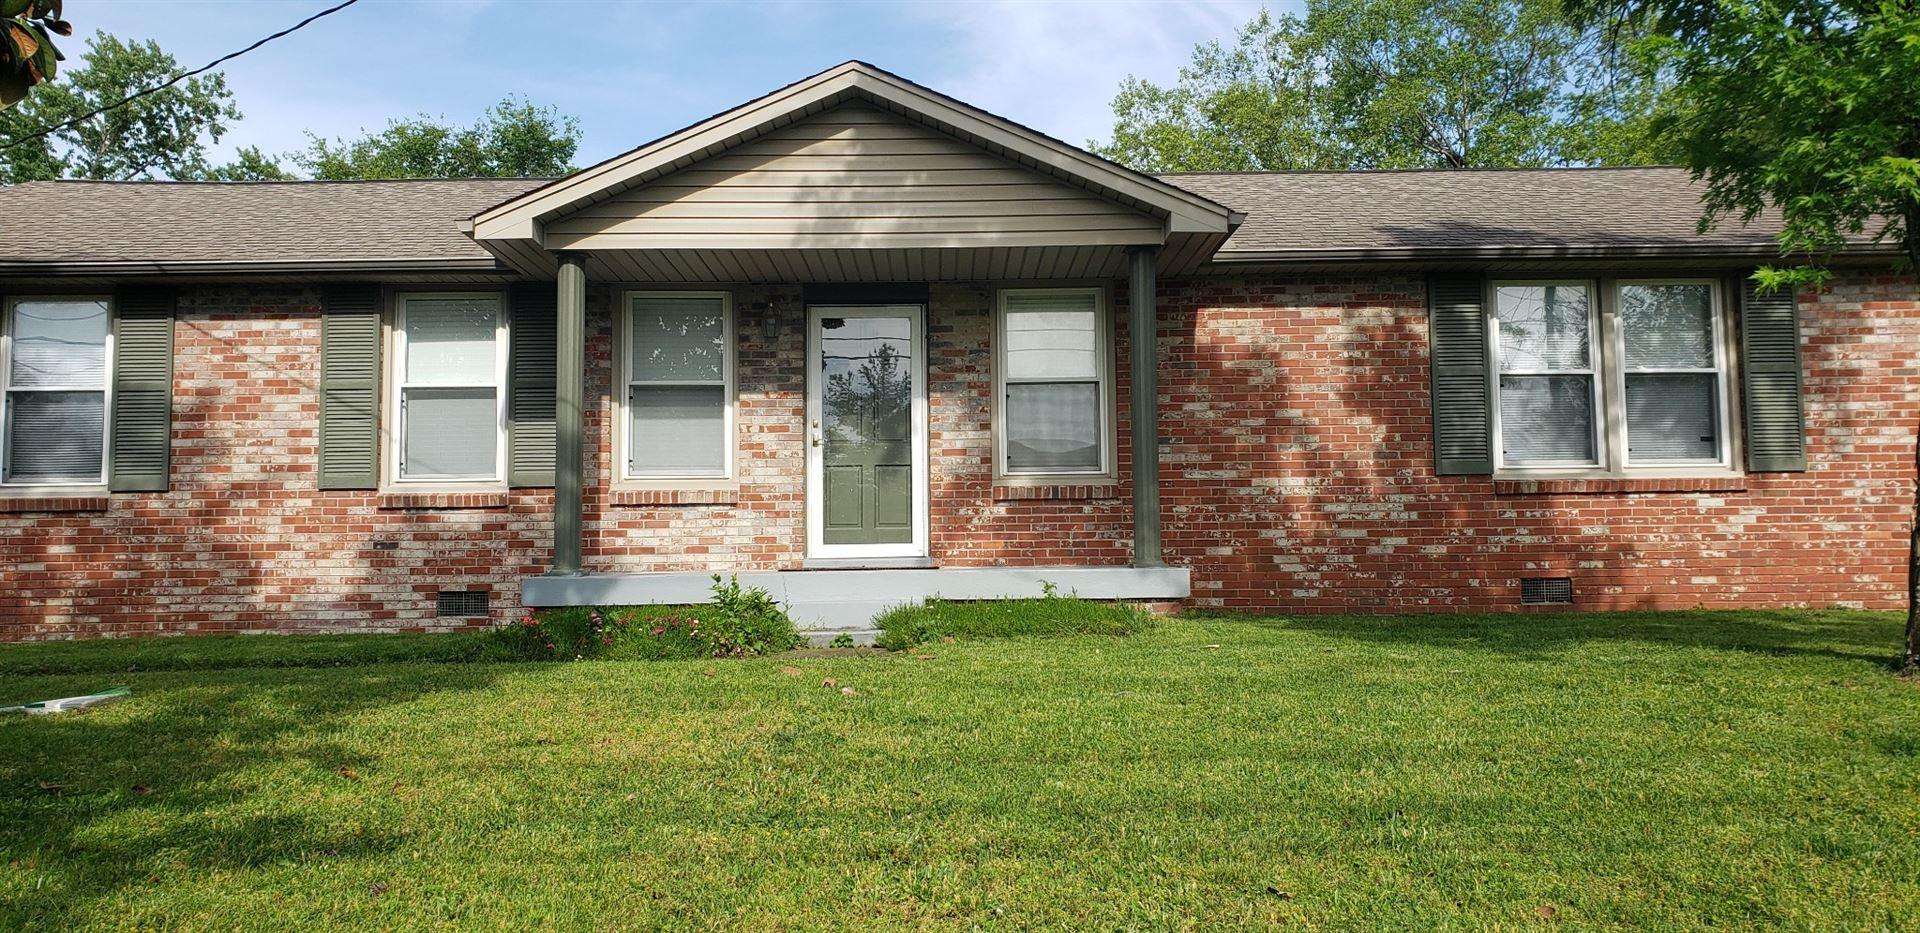 Photo of 8208 Luree Ln, Hermitage, TN 37076 (MLS # 2155484)